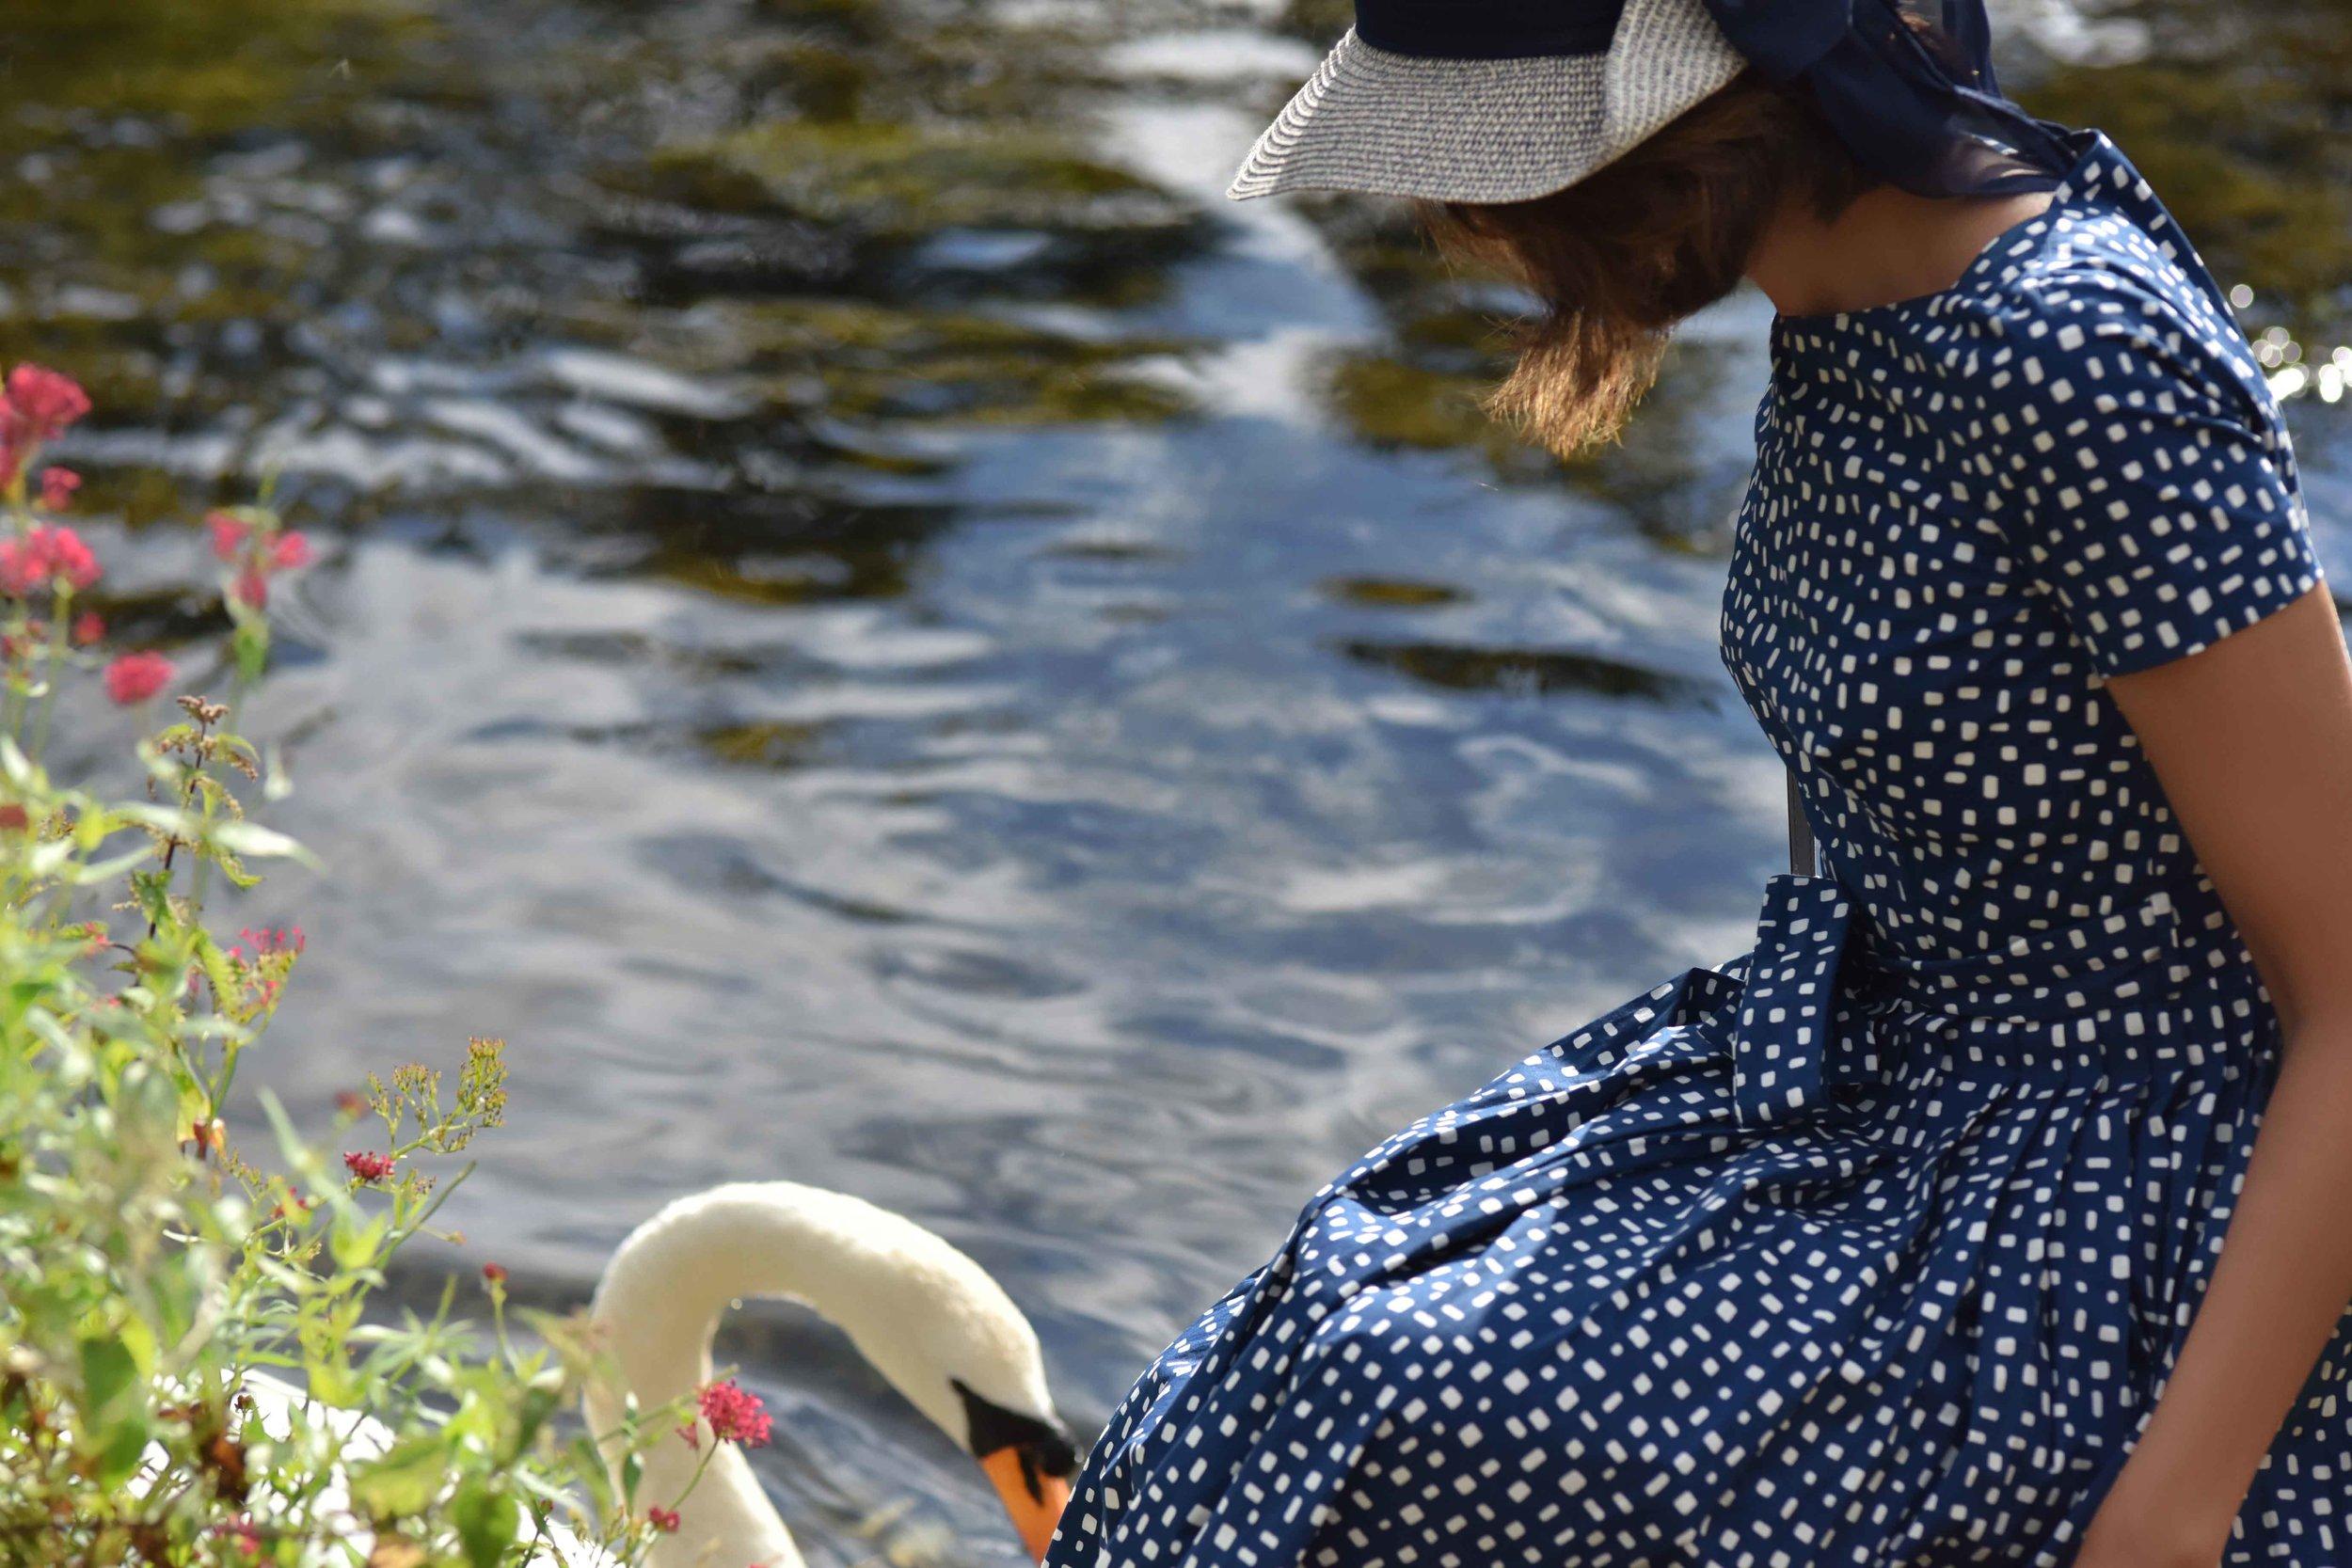 Prada dress, River Coln, Bibury, Cotswold, England. Image©sourcingstyle.com